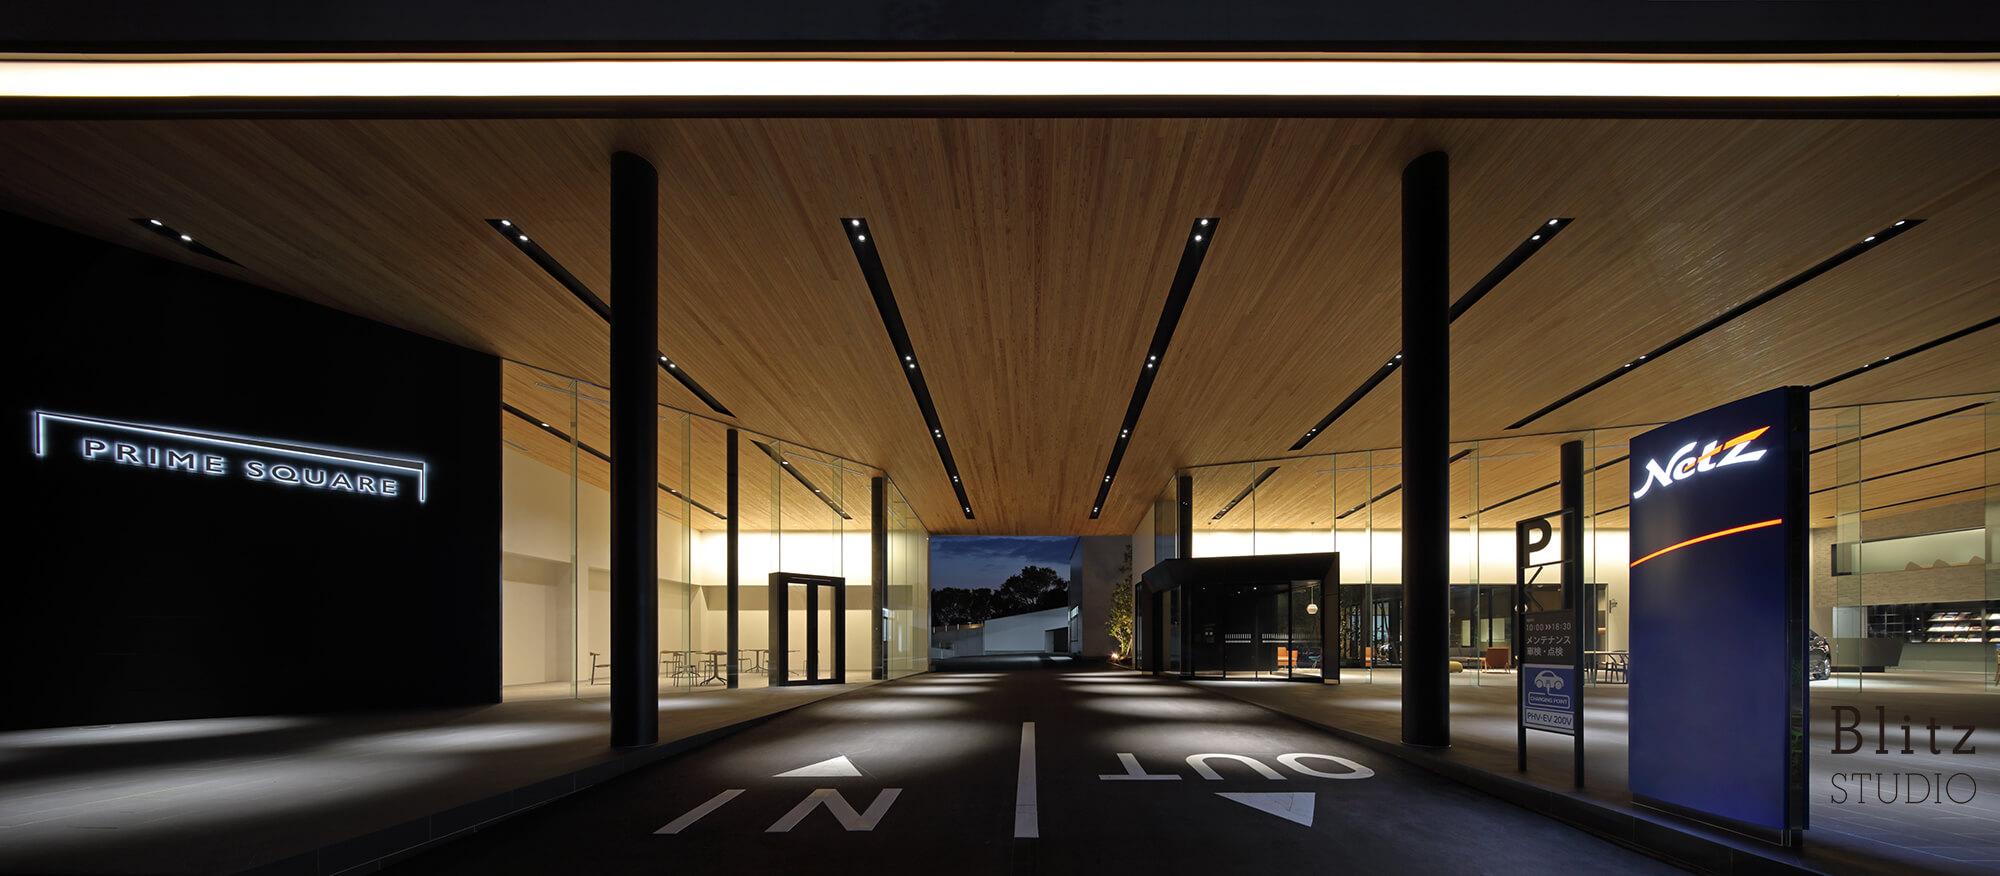 『Netz Toyota Nagasaki PRIME SQUARE』建築写真・竣工写真・インテリア写真12